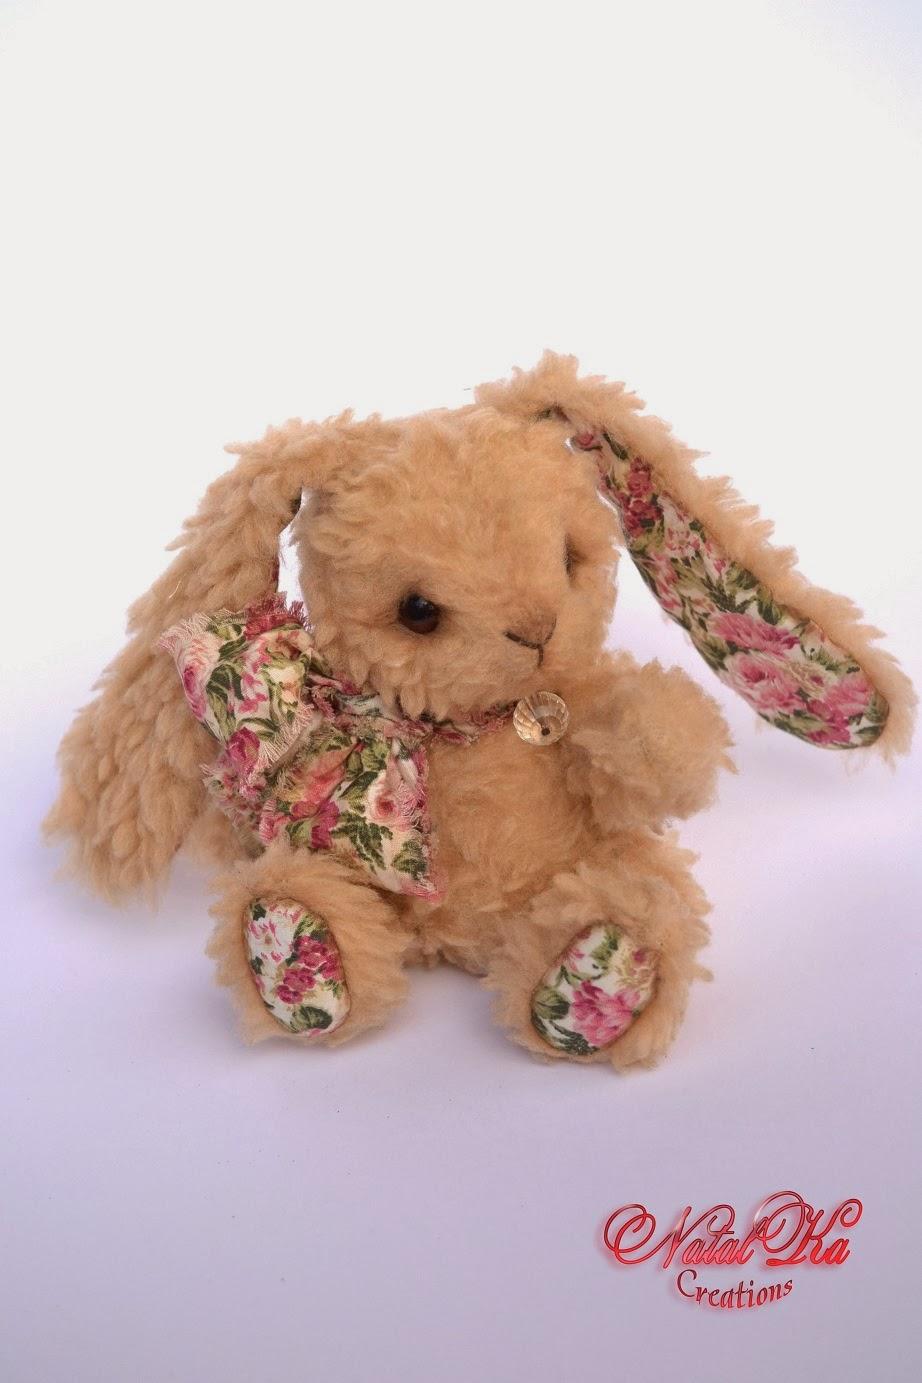 Artist teddy bunny handmade by Natalka Creations